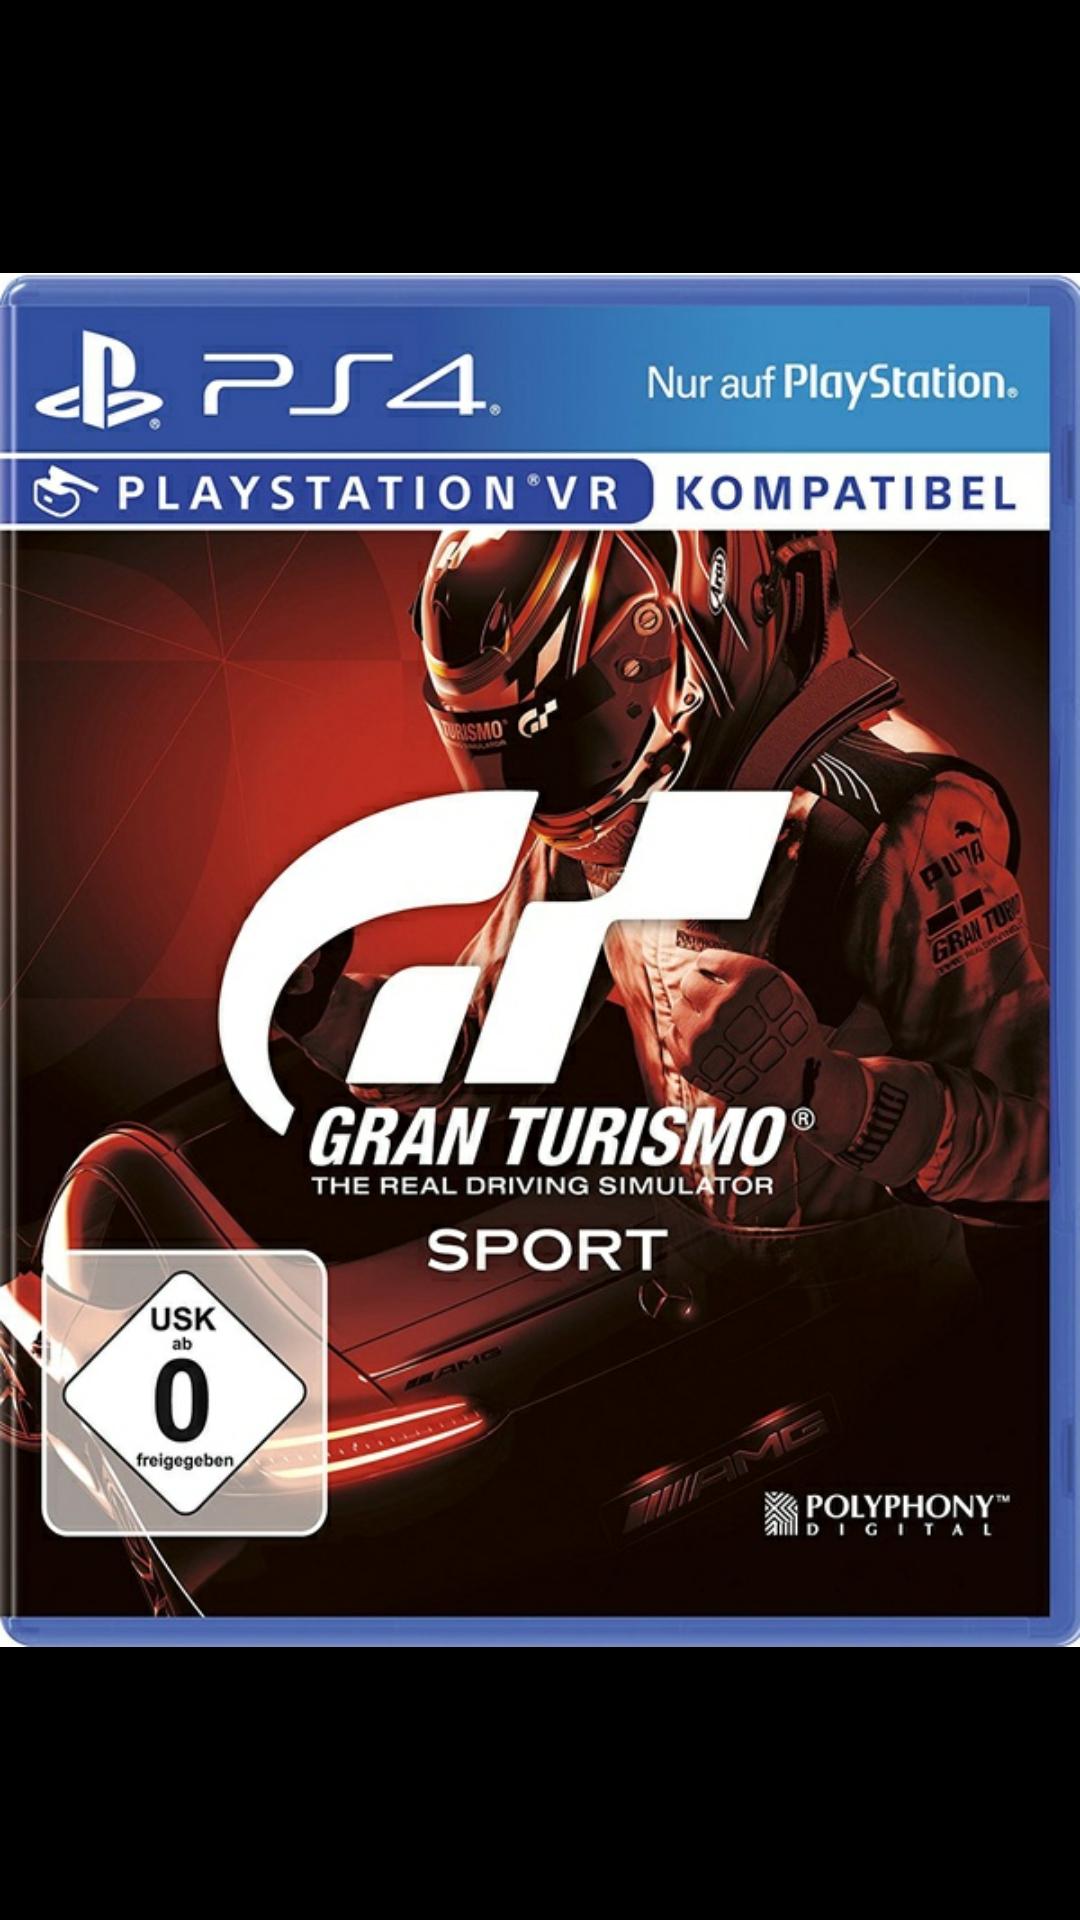 [eBay + Media Markt (Link im Deal)] Gran Turismo Sport Day 1 Edition